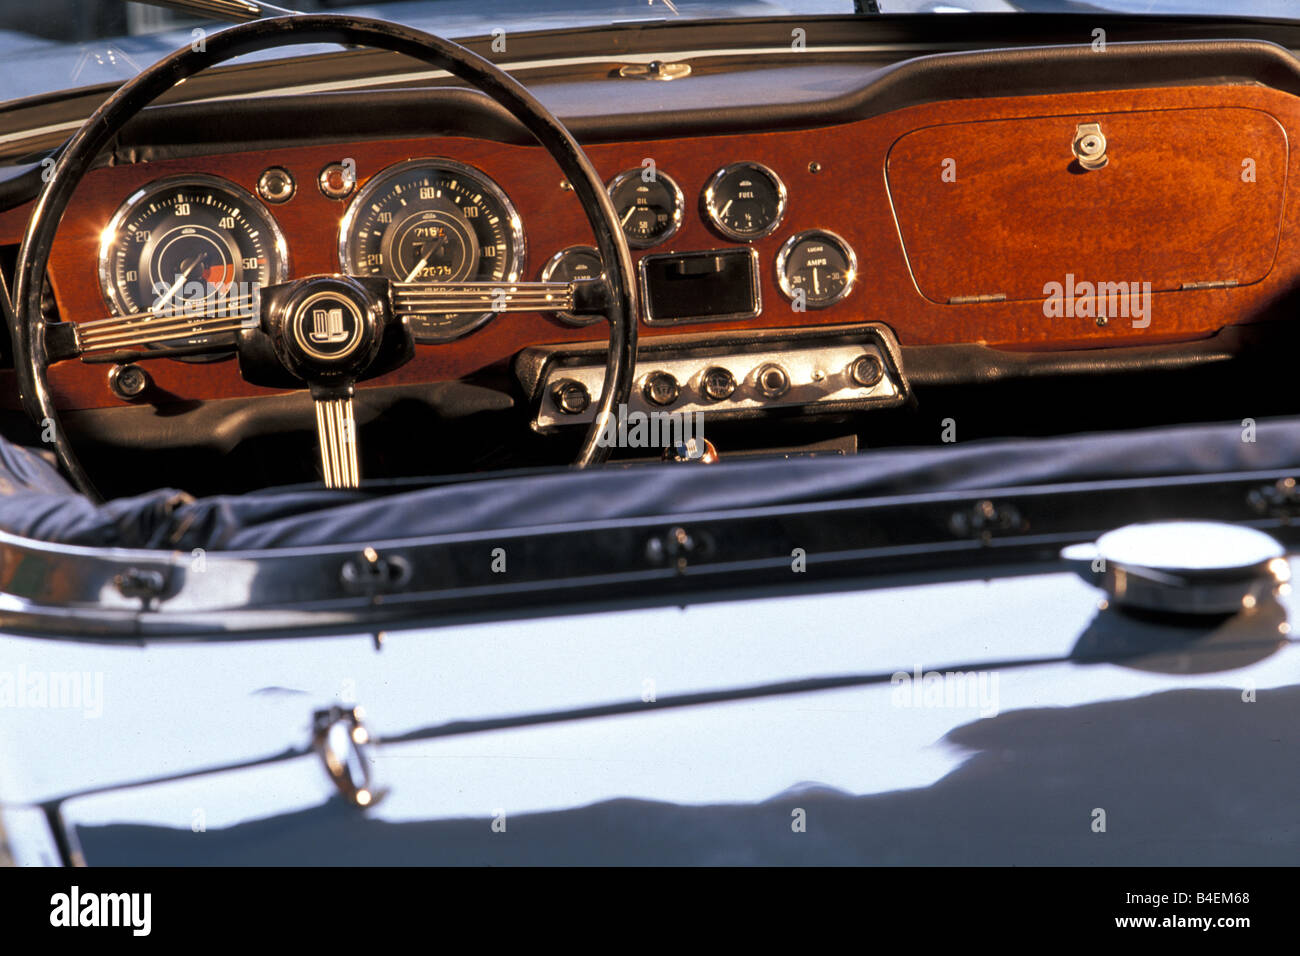 Car, Triumph TR 4, model year 1961-1965, vintage car, 1960s, sixties, sky-blue, convertible,  interior, Cockpit, - Stock Image